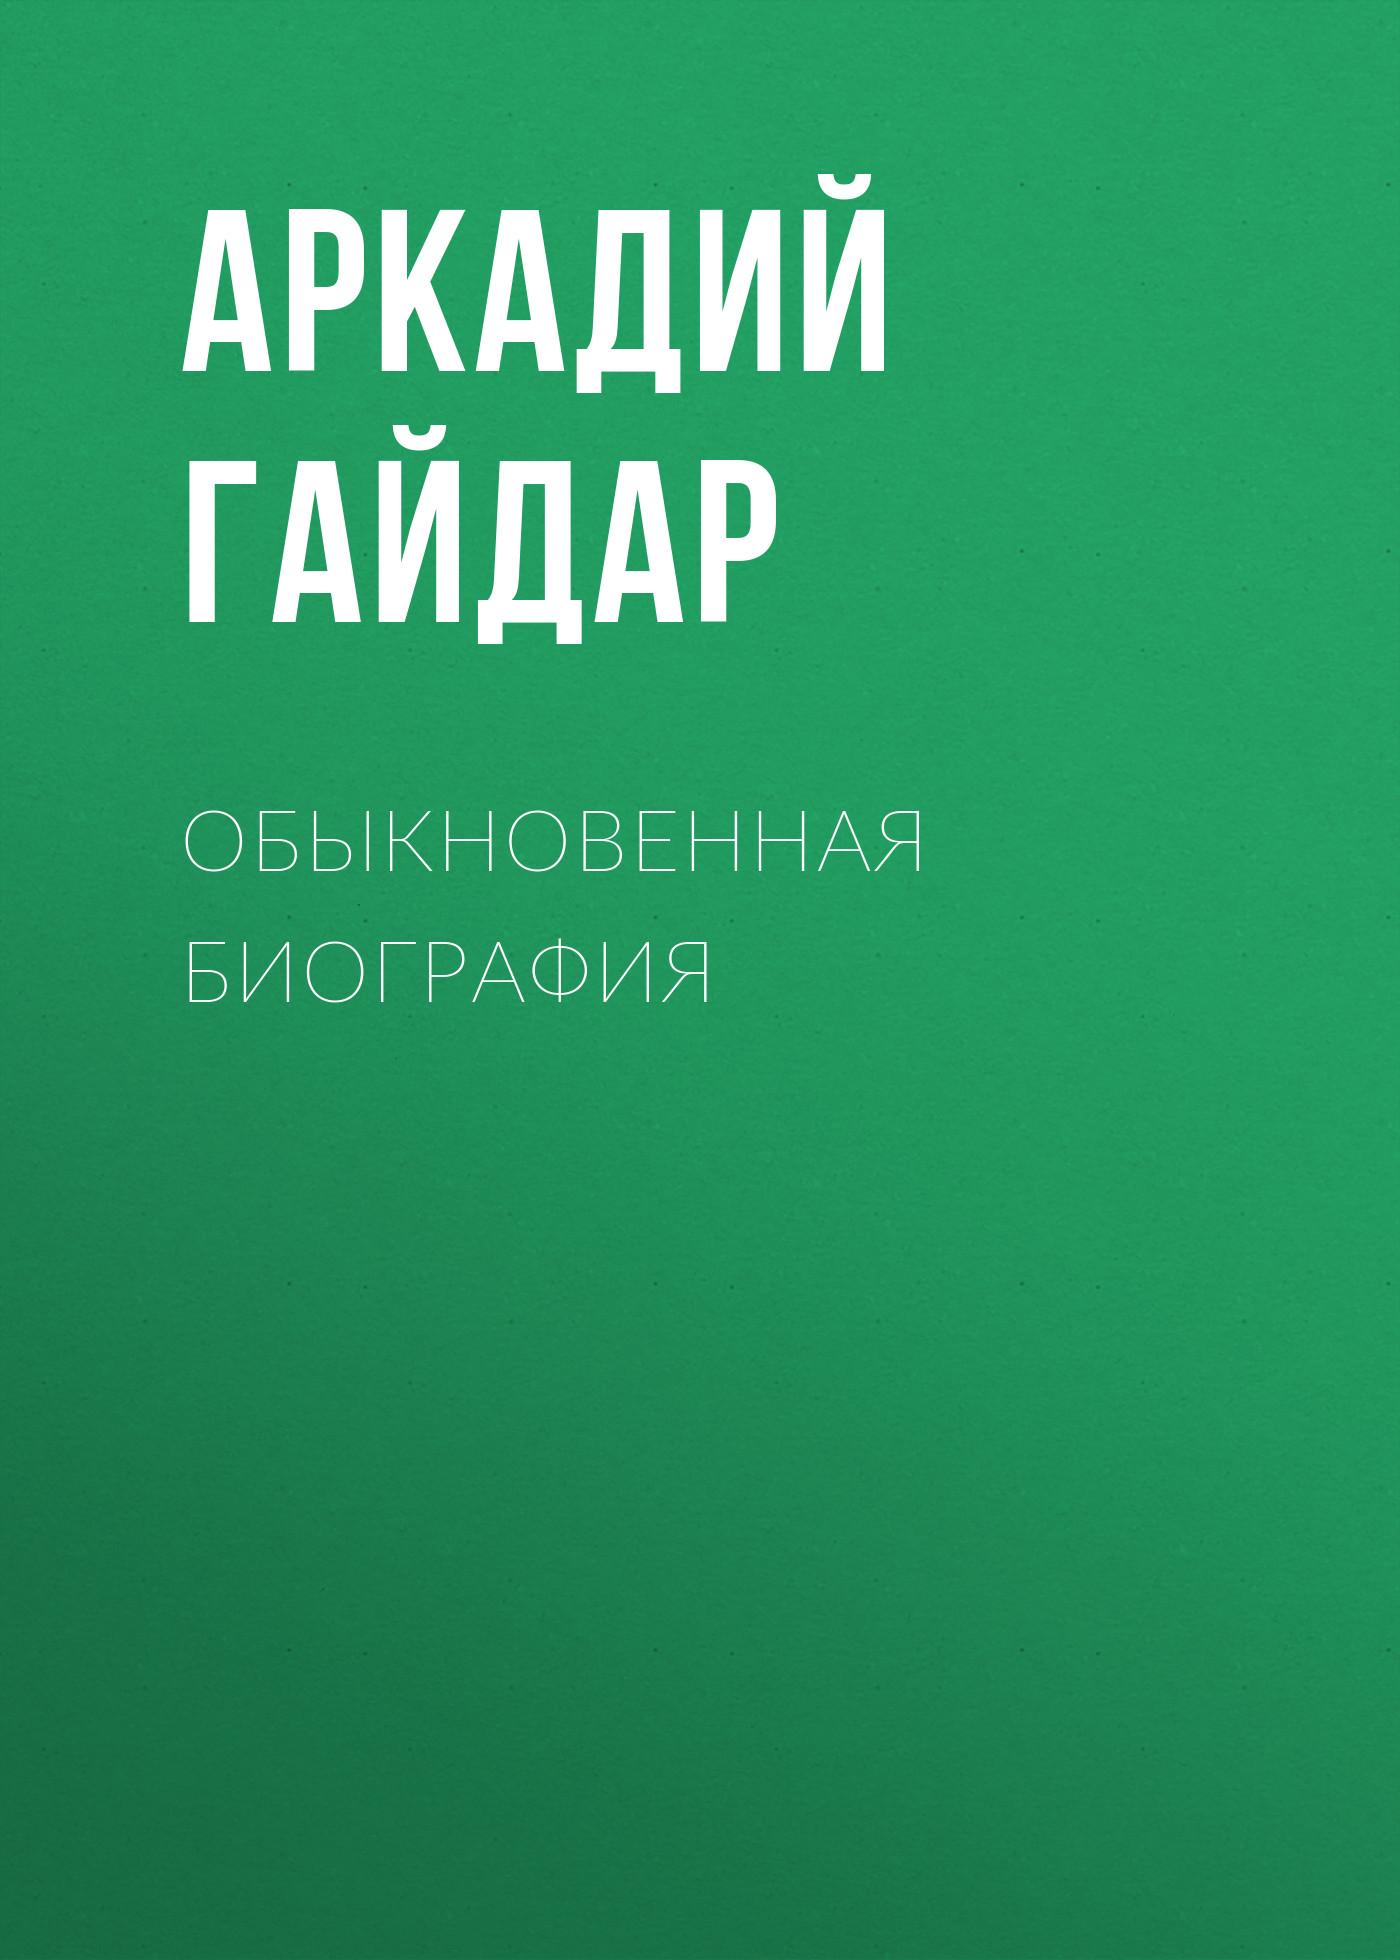 Аркадий Гайдар Обыкновенная биография аркадий гайдар обыкновенная биография